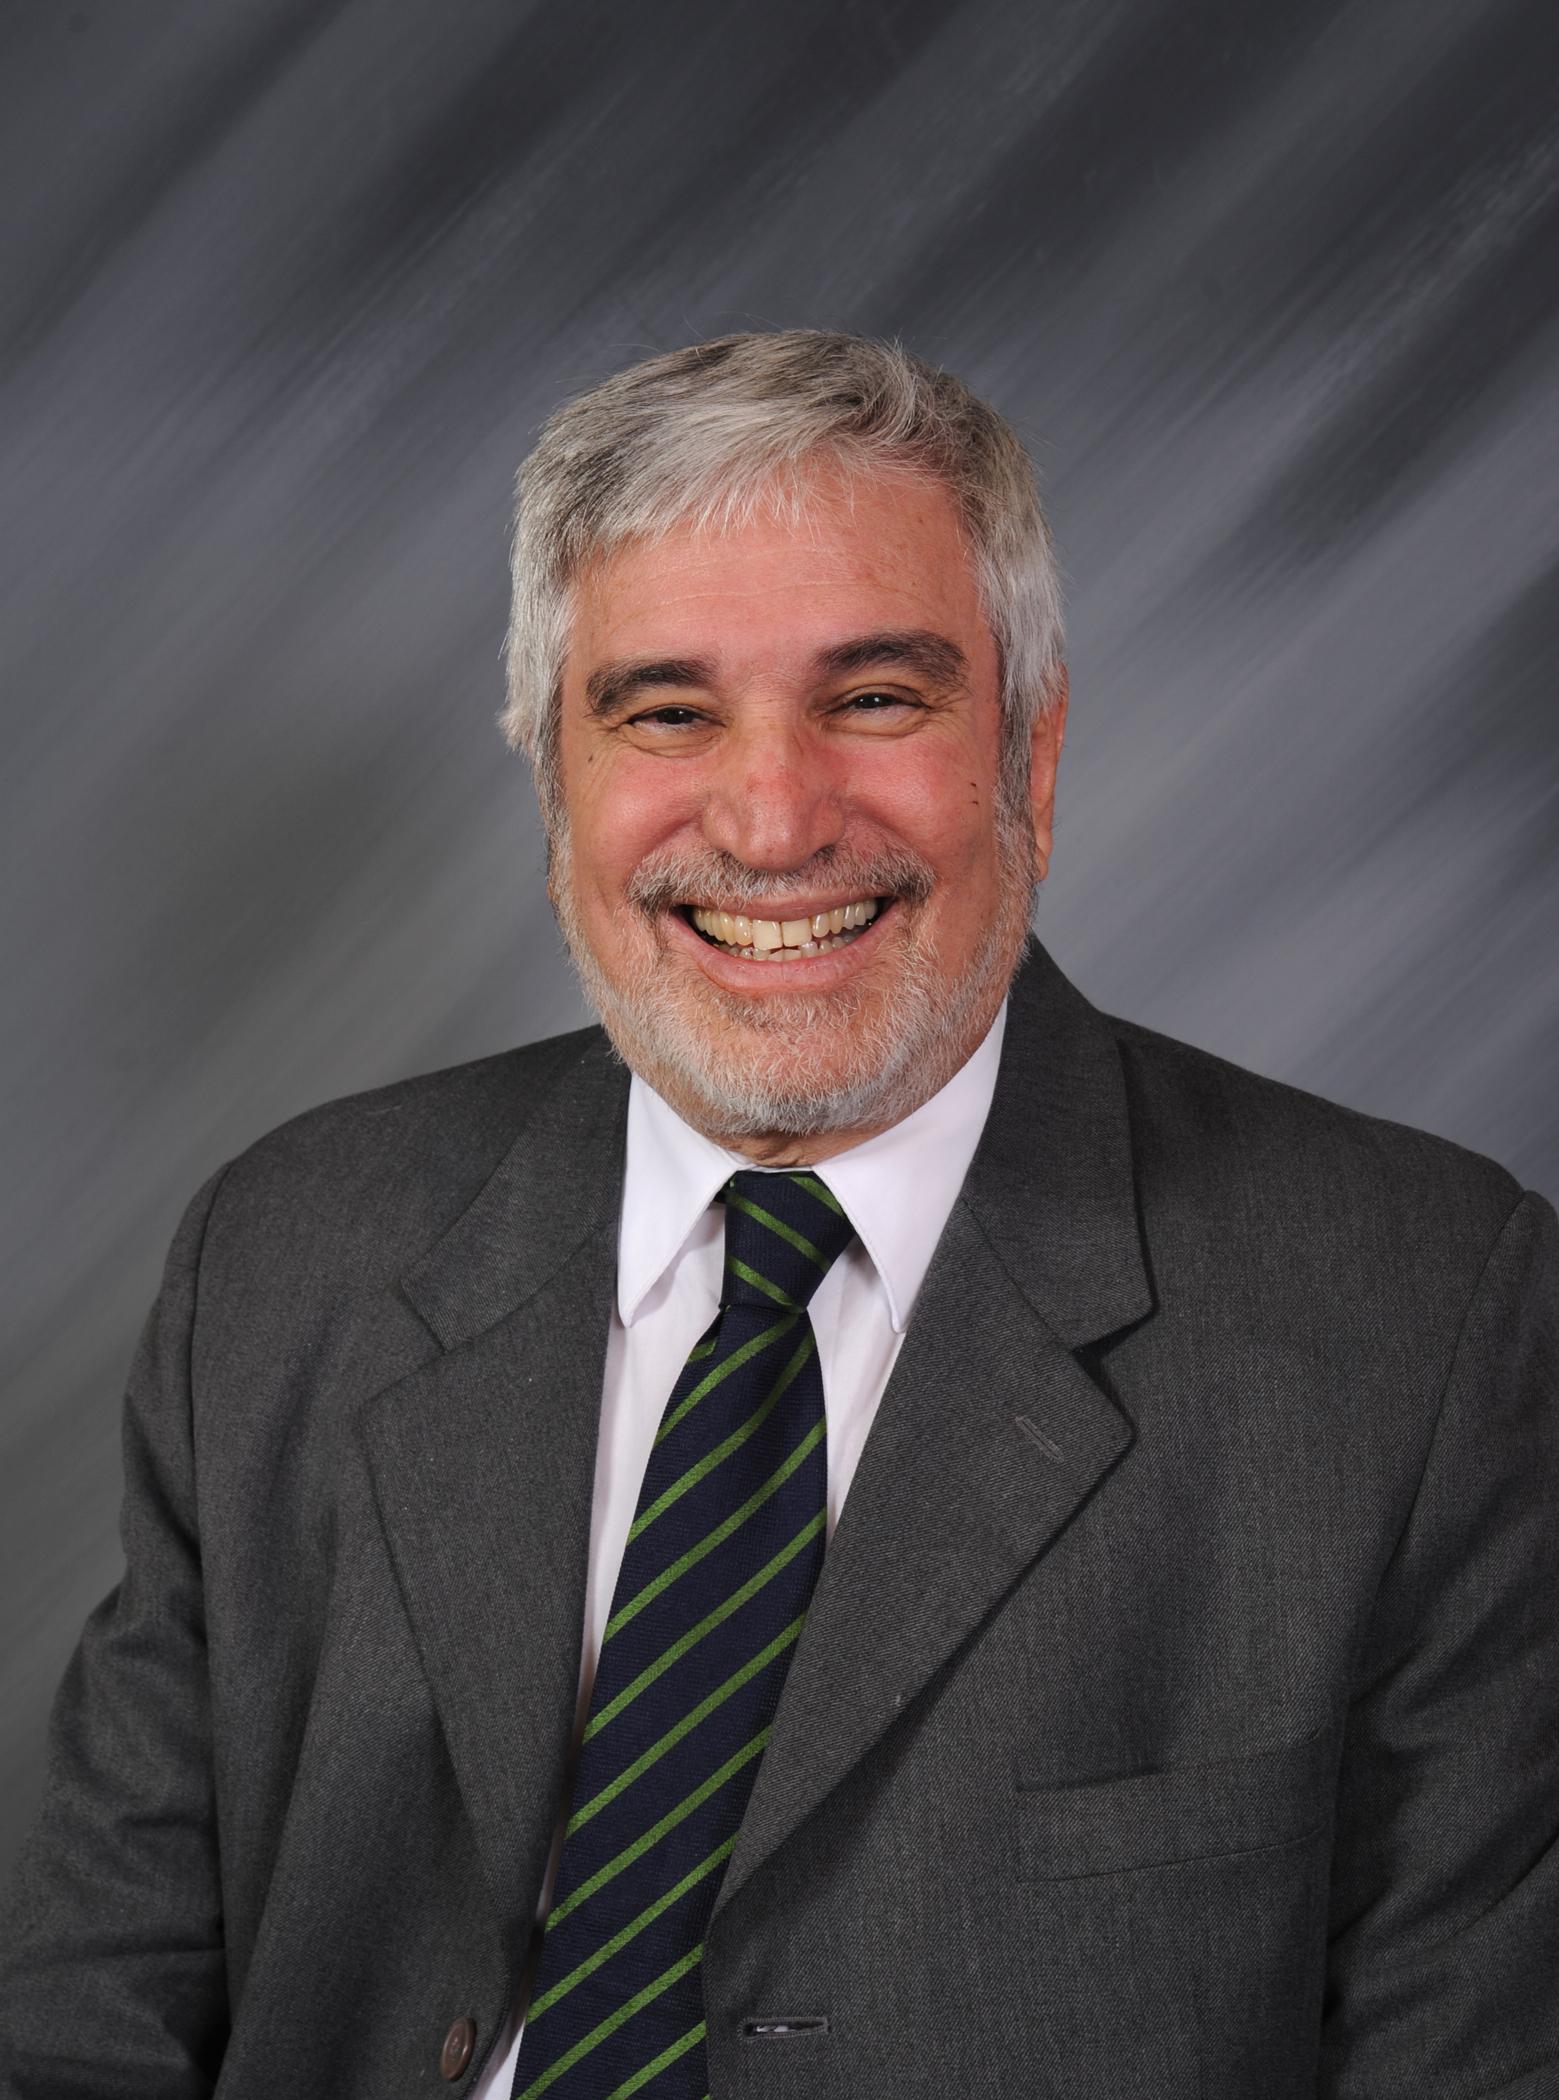 Dr. Peter Tarlow, president